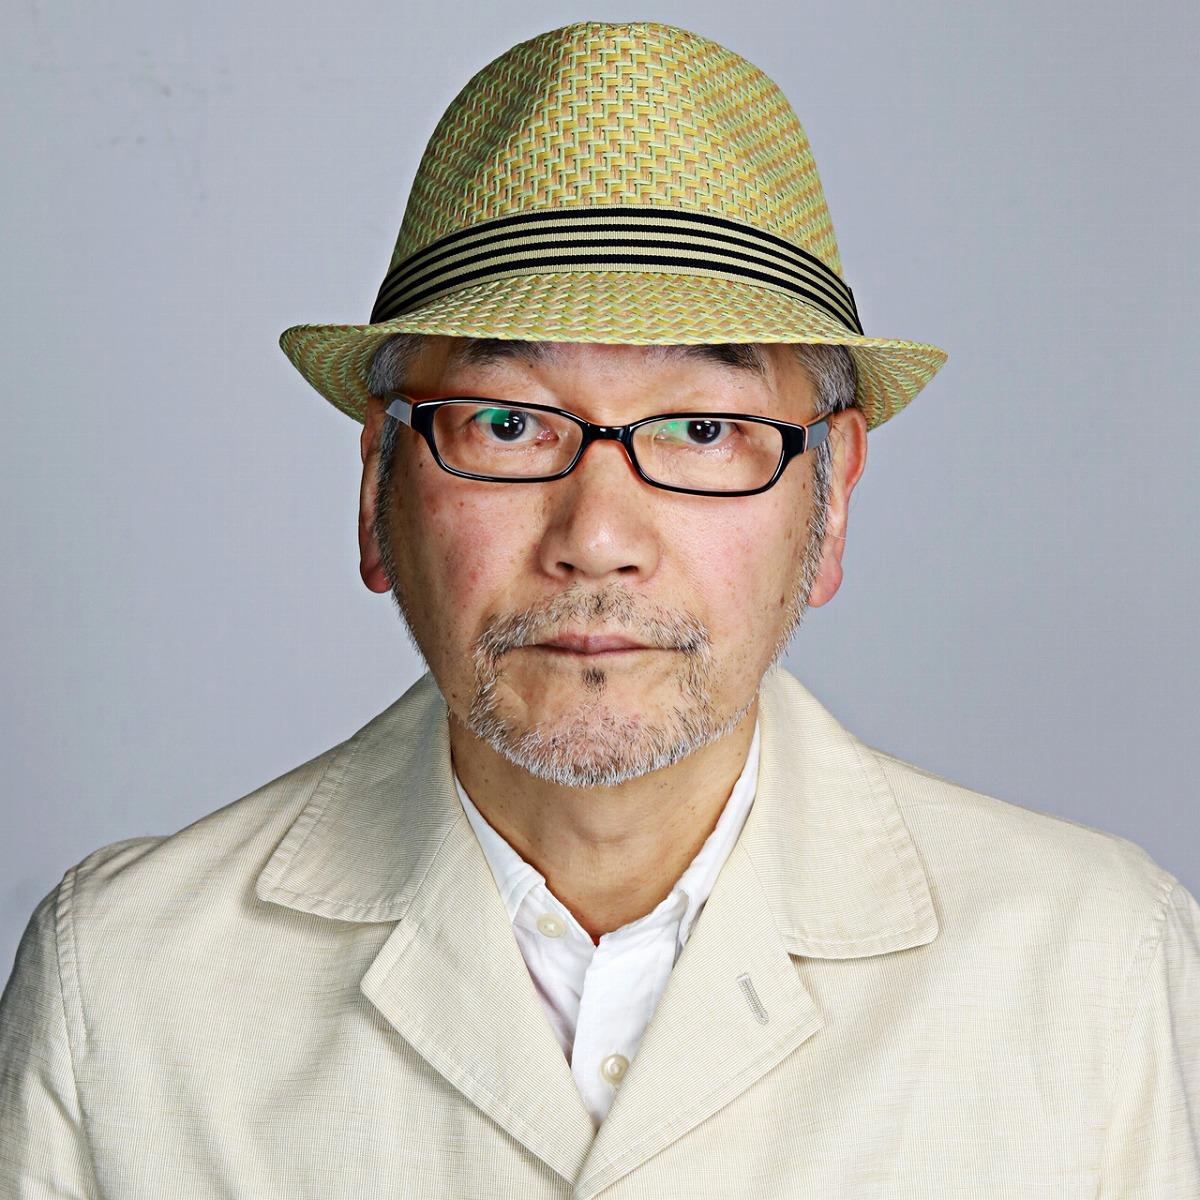 a227c3599e9d7c ... Size import hat straw hat green pink beige [cowboy hat] which paper hat  hat ...